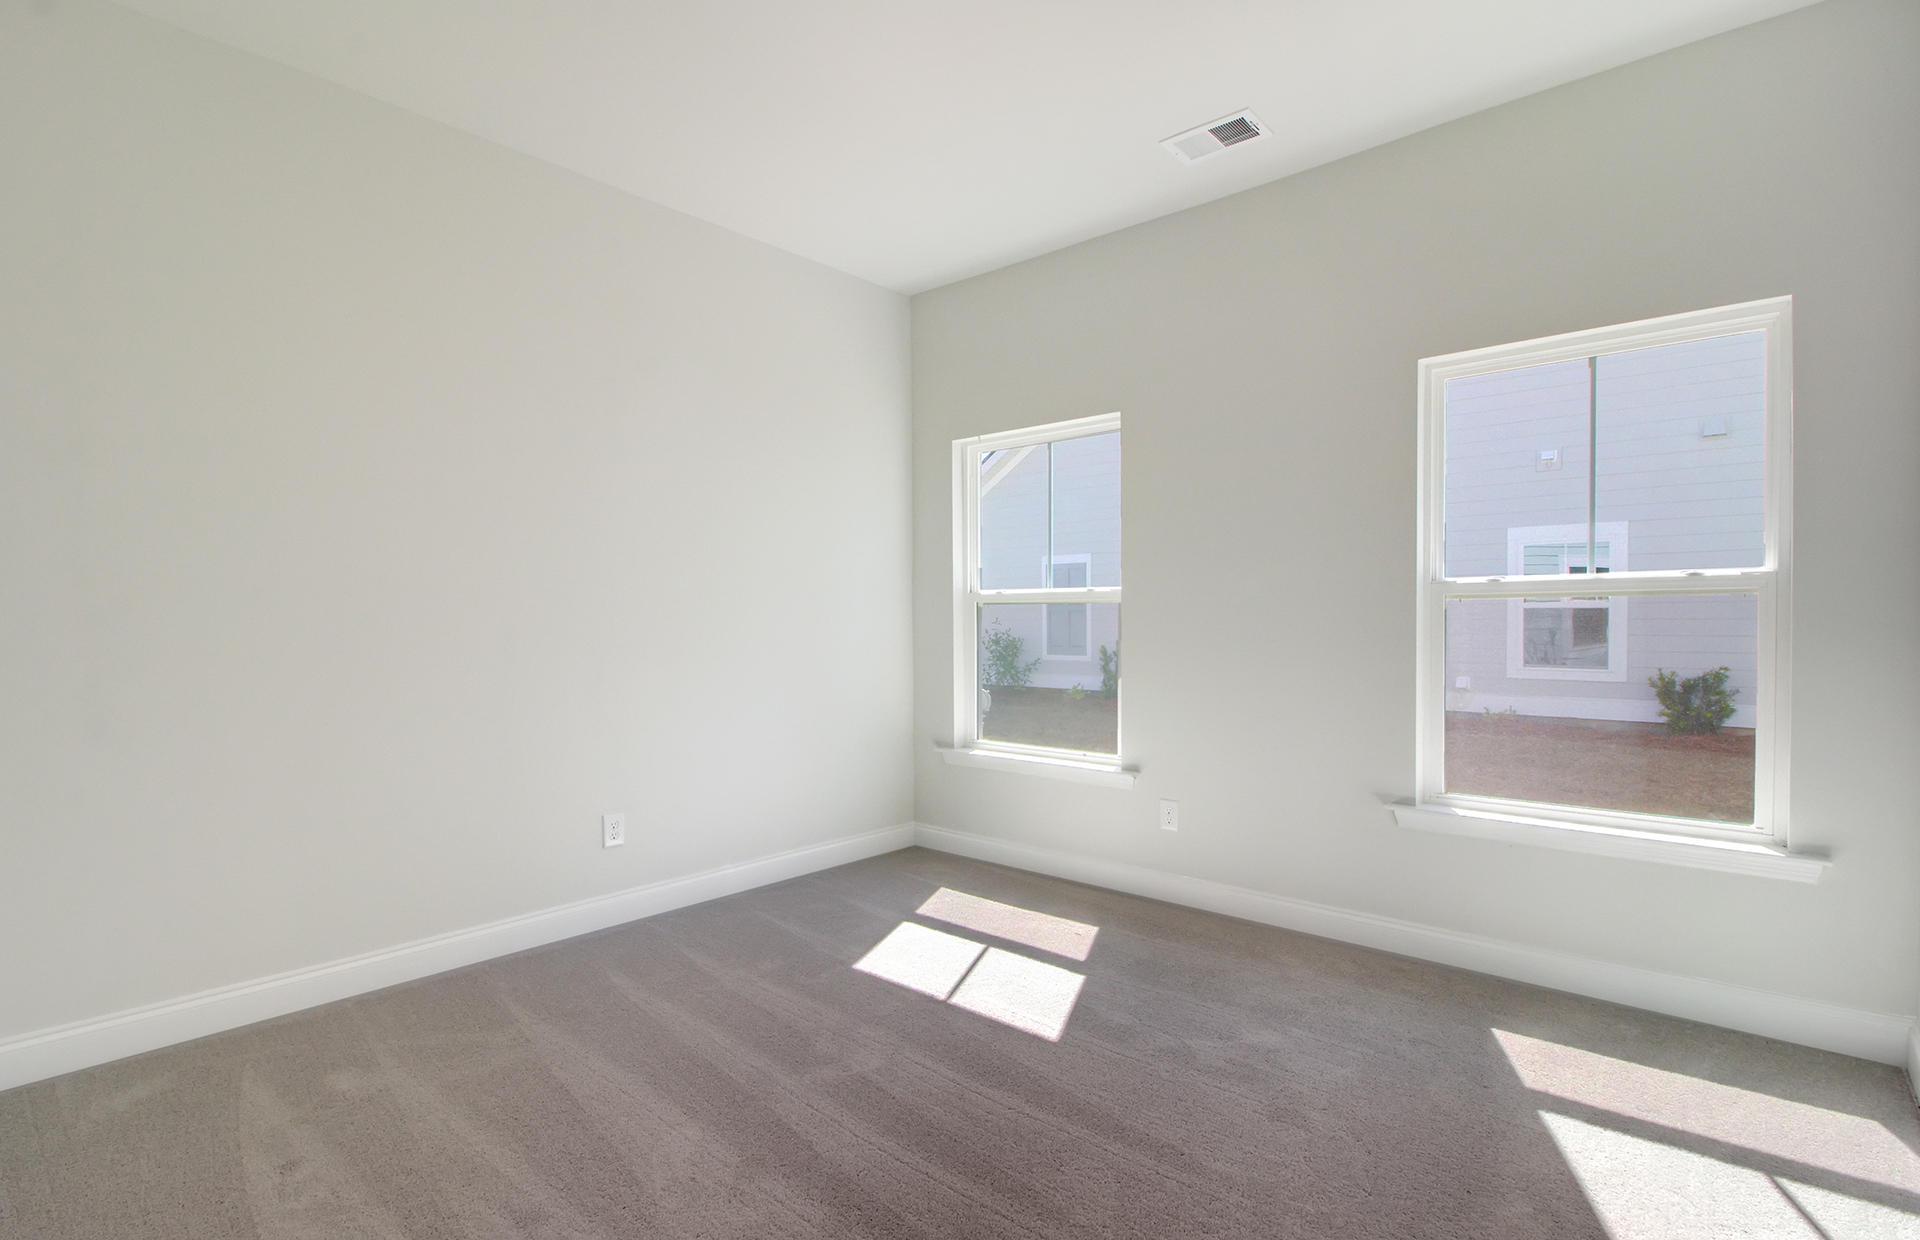 Park West Homes For Sale - 3066 Rice Field, Mount Pleasant, SC - 46